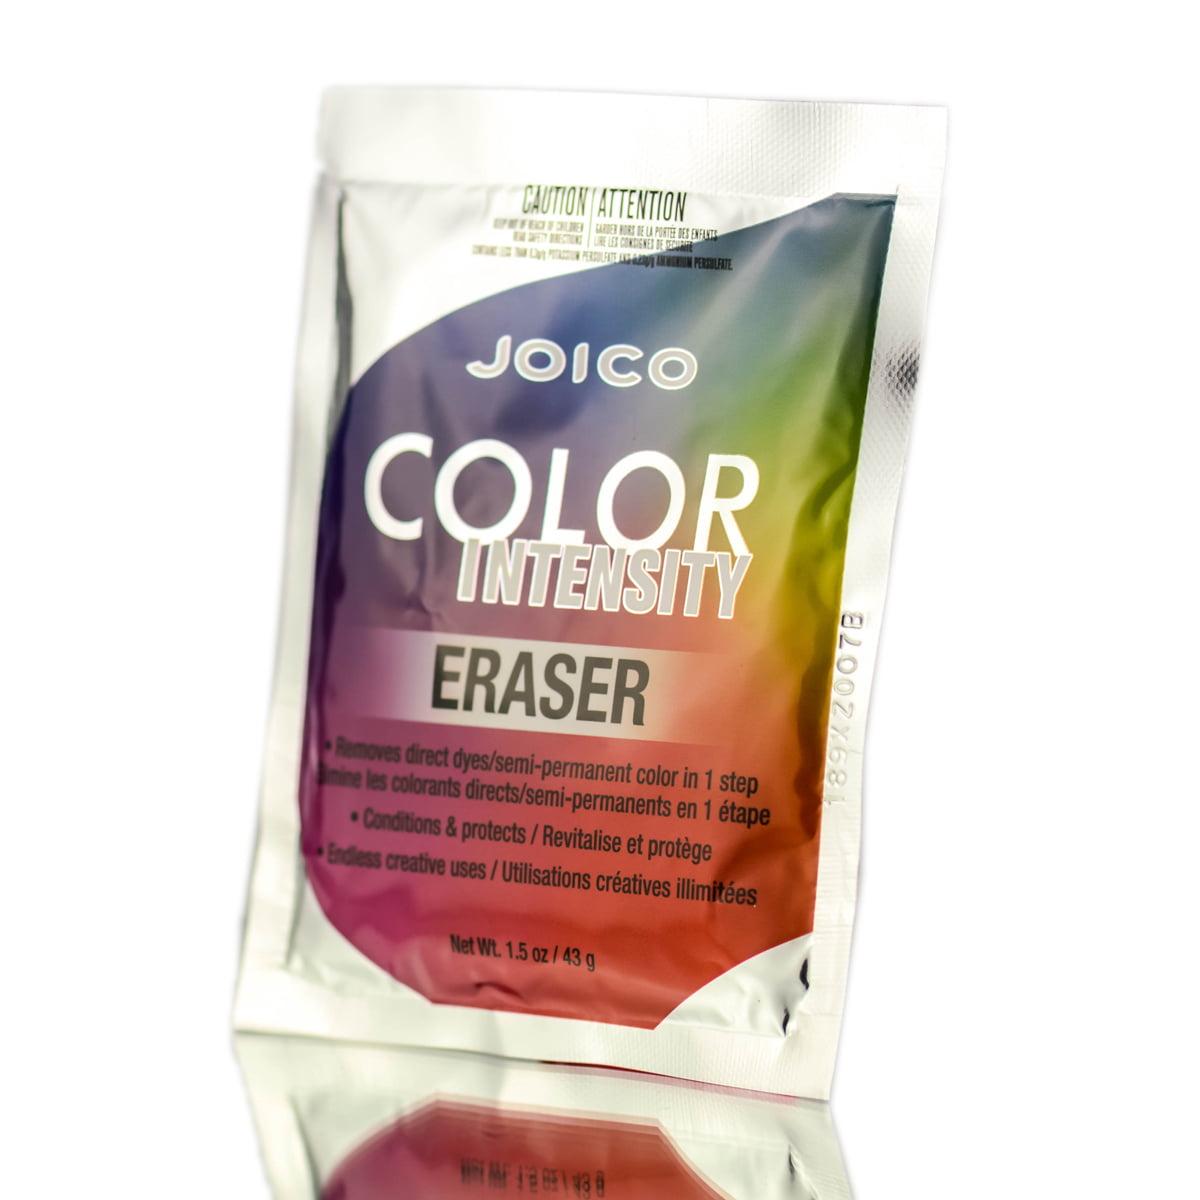 Joico hair color tags color jocio joico - Joico Hair Color Tags Color Jocio Joico 37